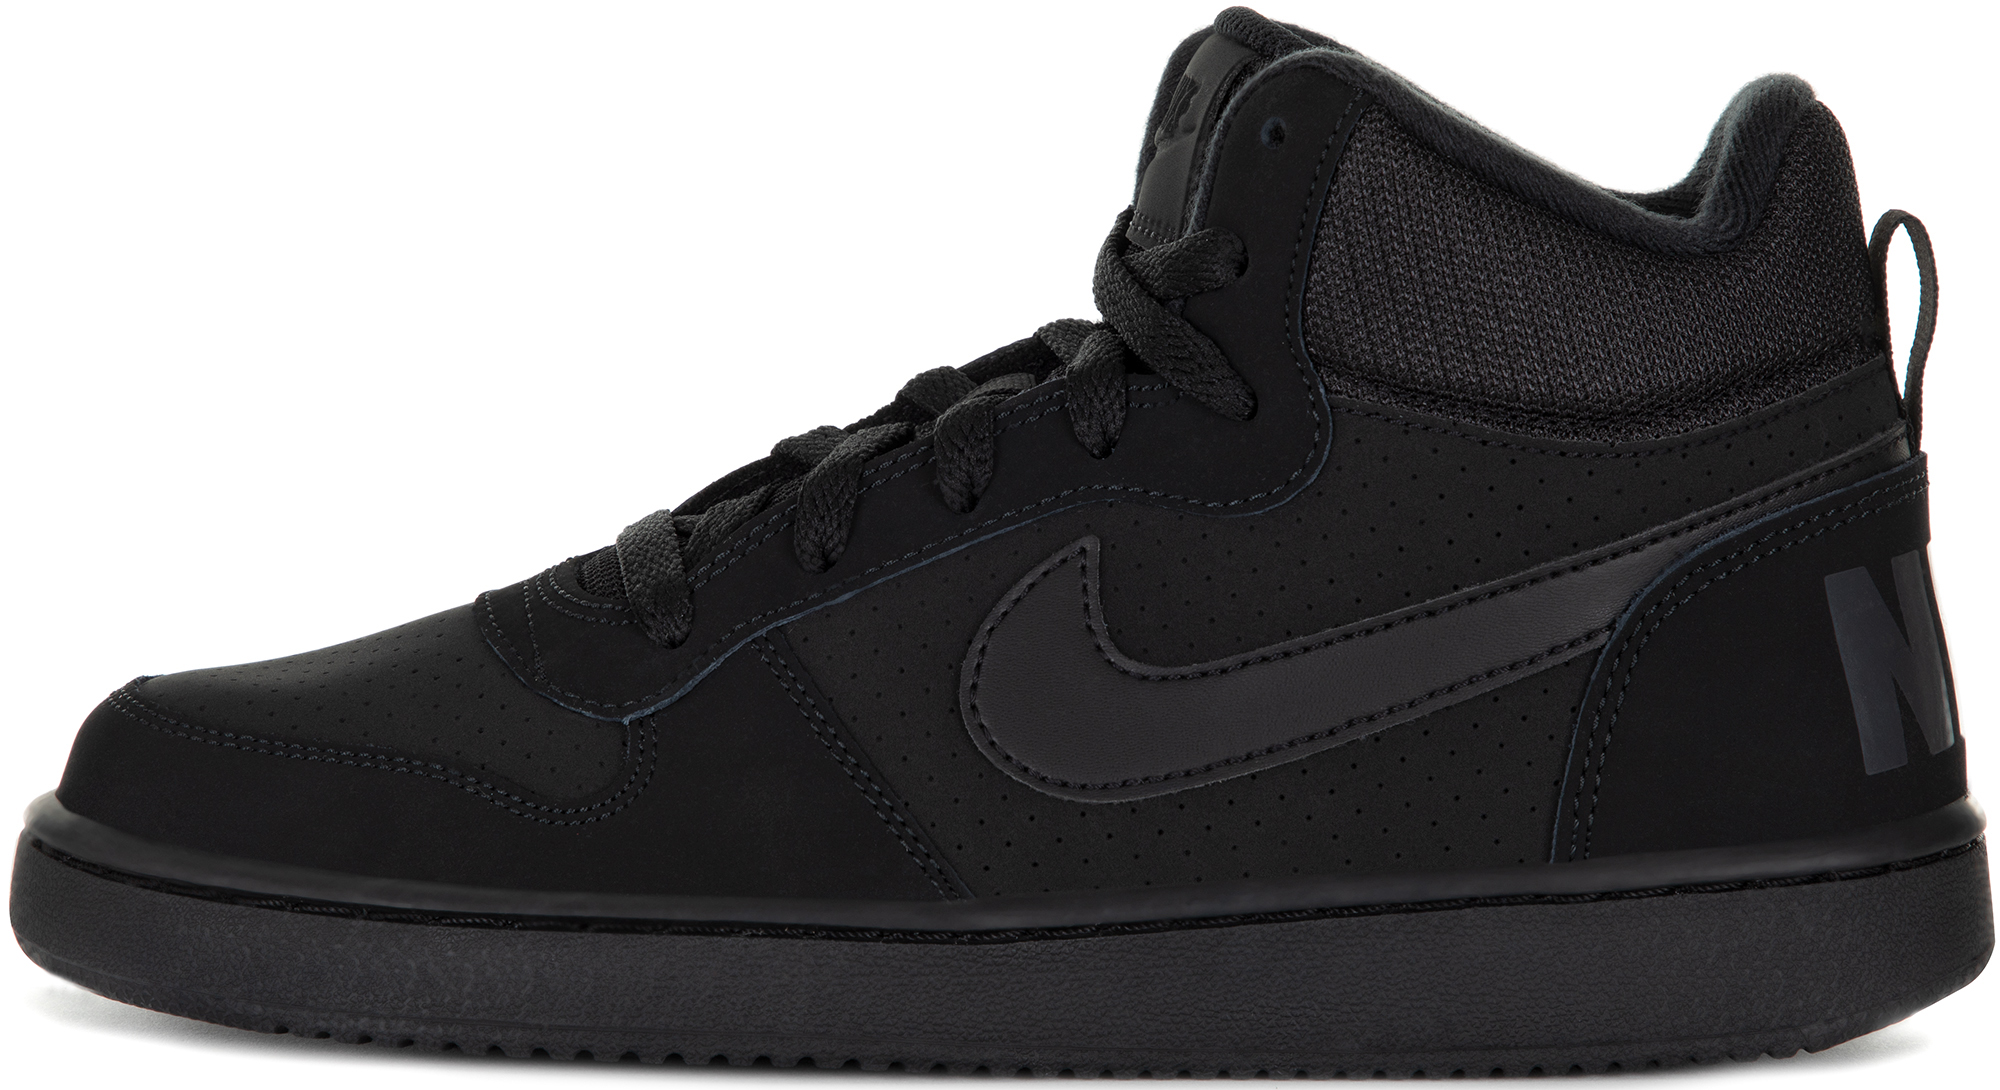 Nike Кеды для мальчиков Nike Court Borough Mid, размер 39 nike майка женская nike court slam